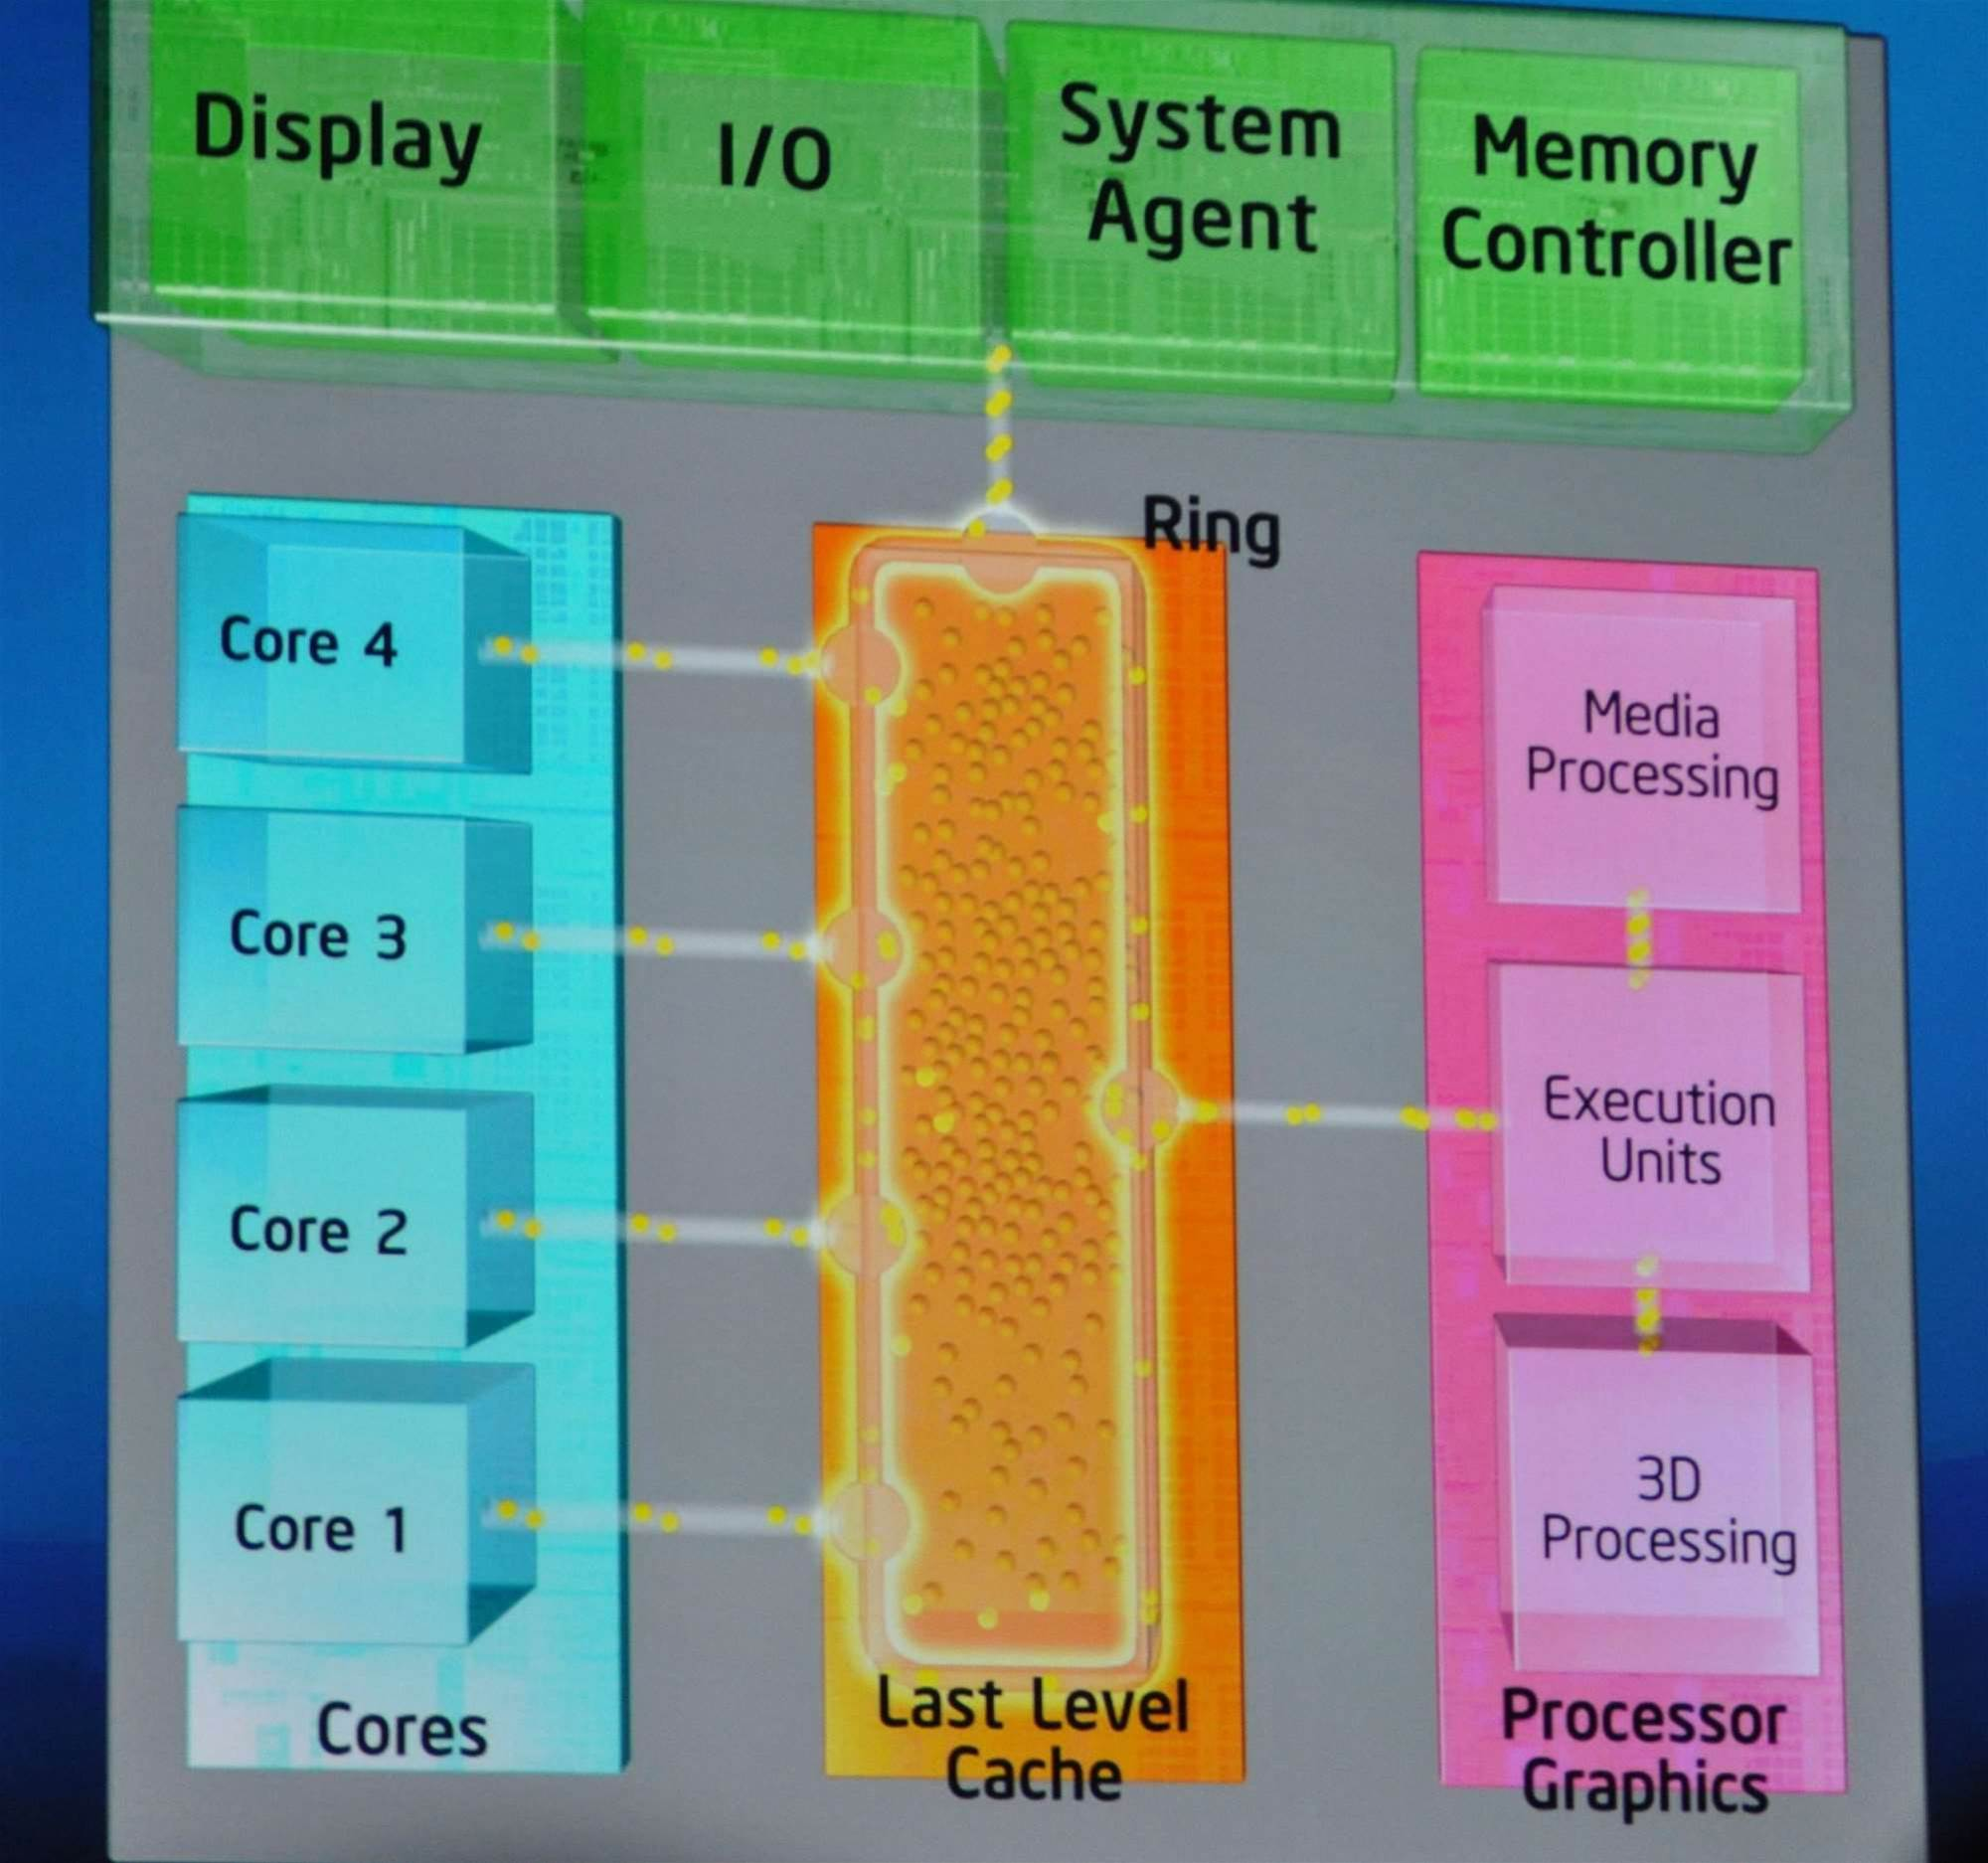 Intel's Ring